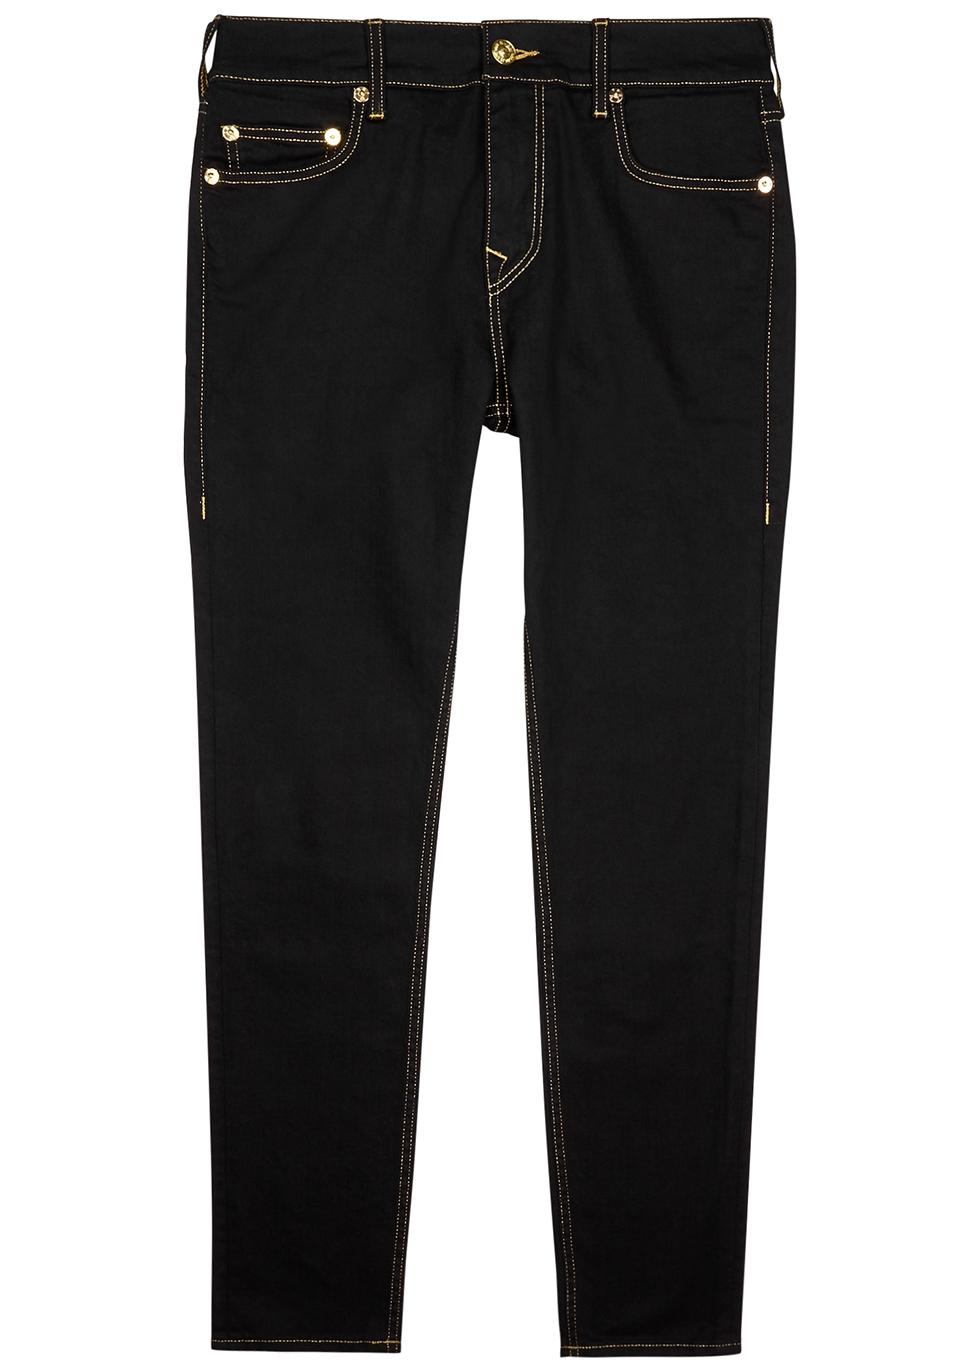 Jack No Flap black slim-leg jeans